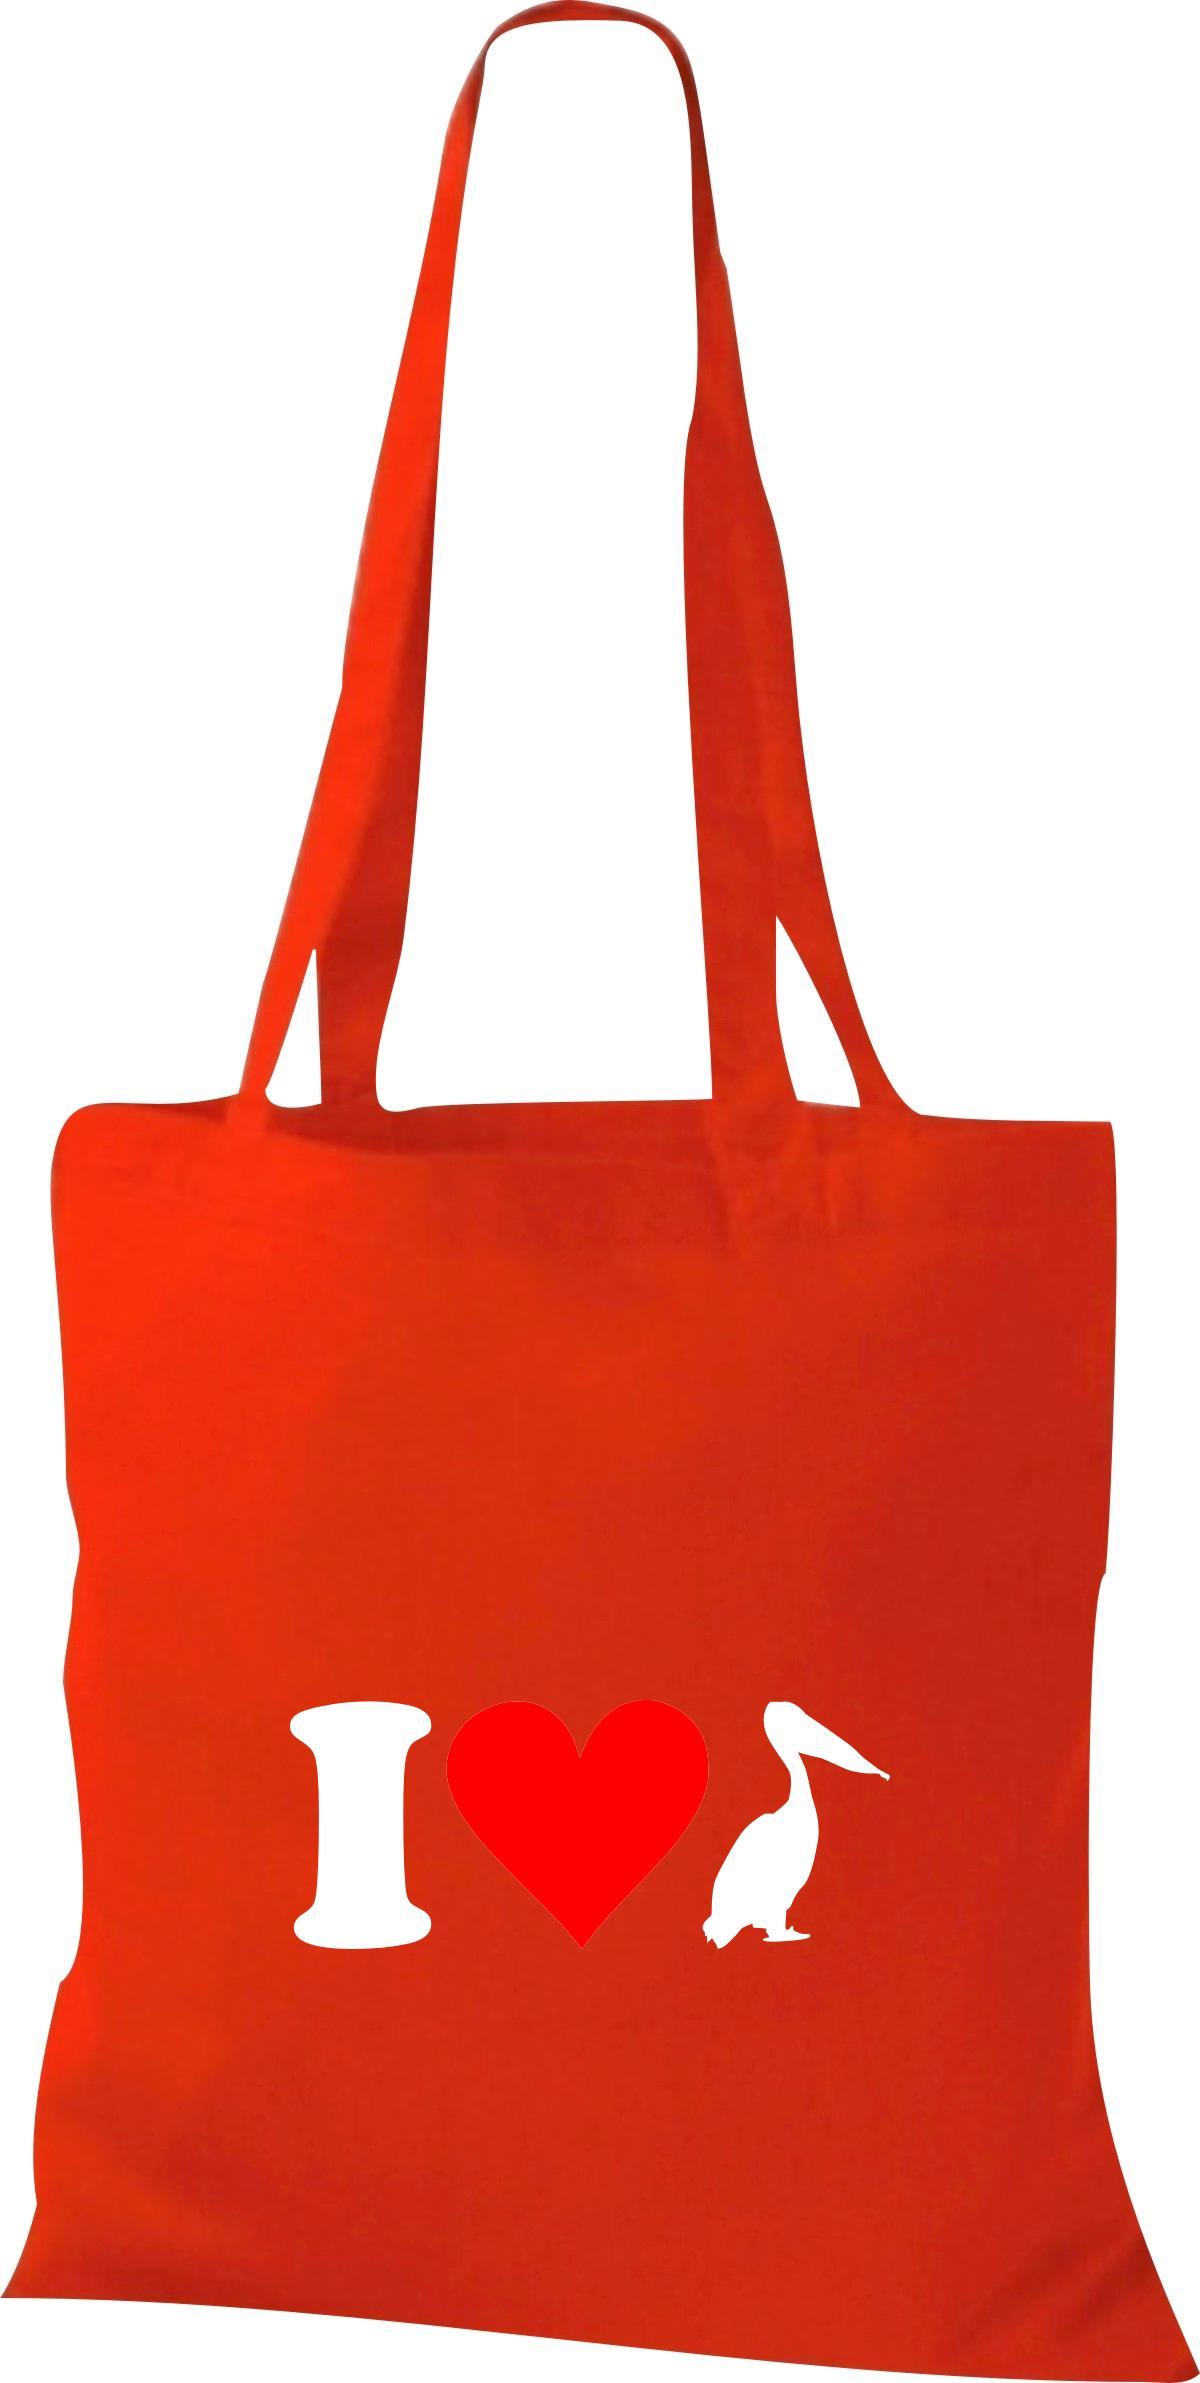 Stoffbeutel I Love Pelikan Tiere Tiermotive Naturkult, Baumwolltasche viele Farb